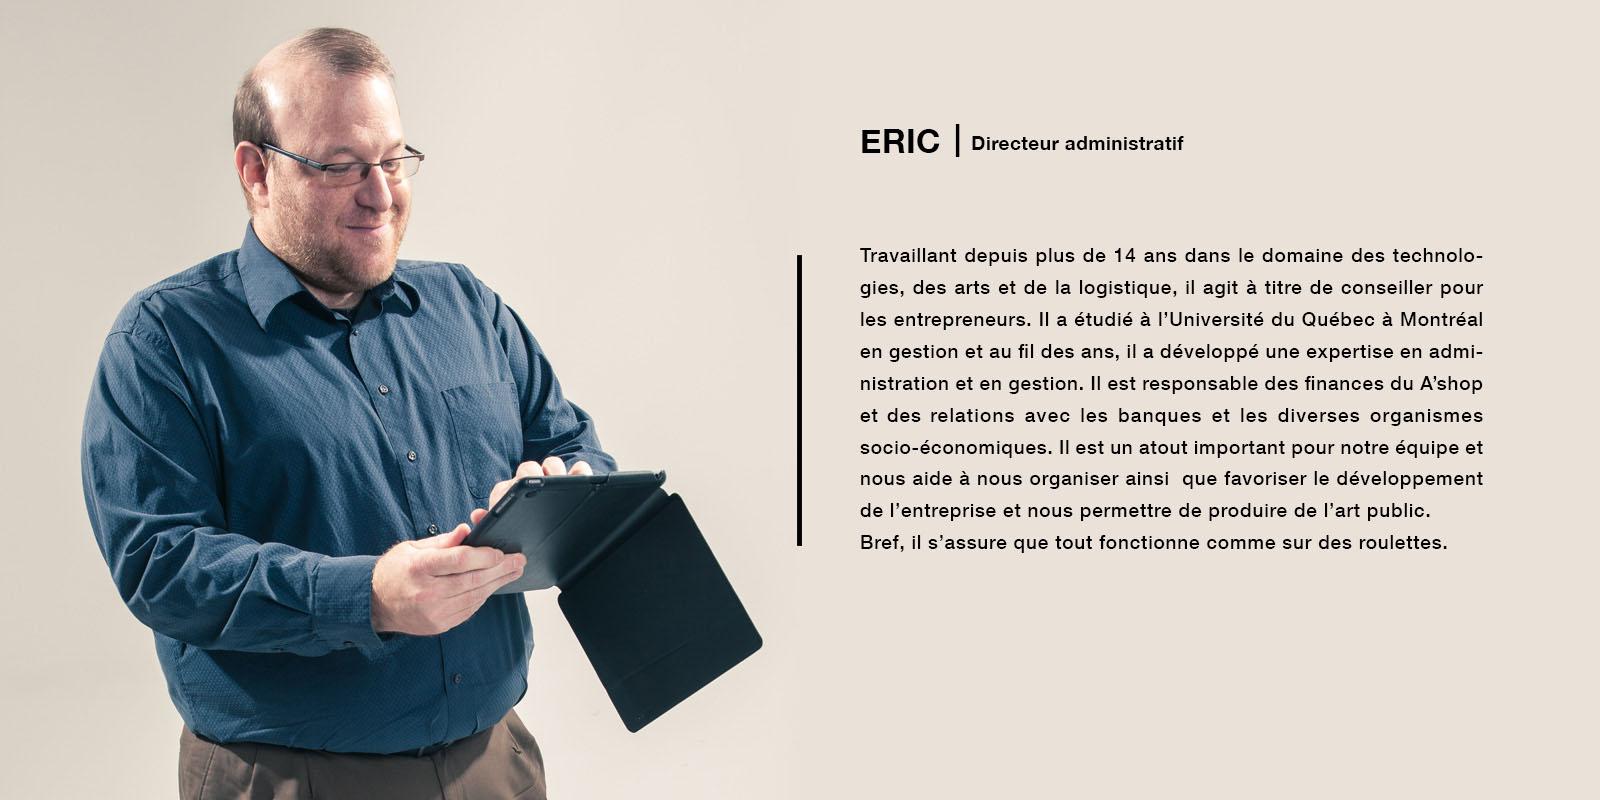 Eric_FR.jpg